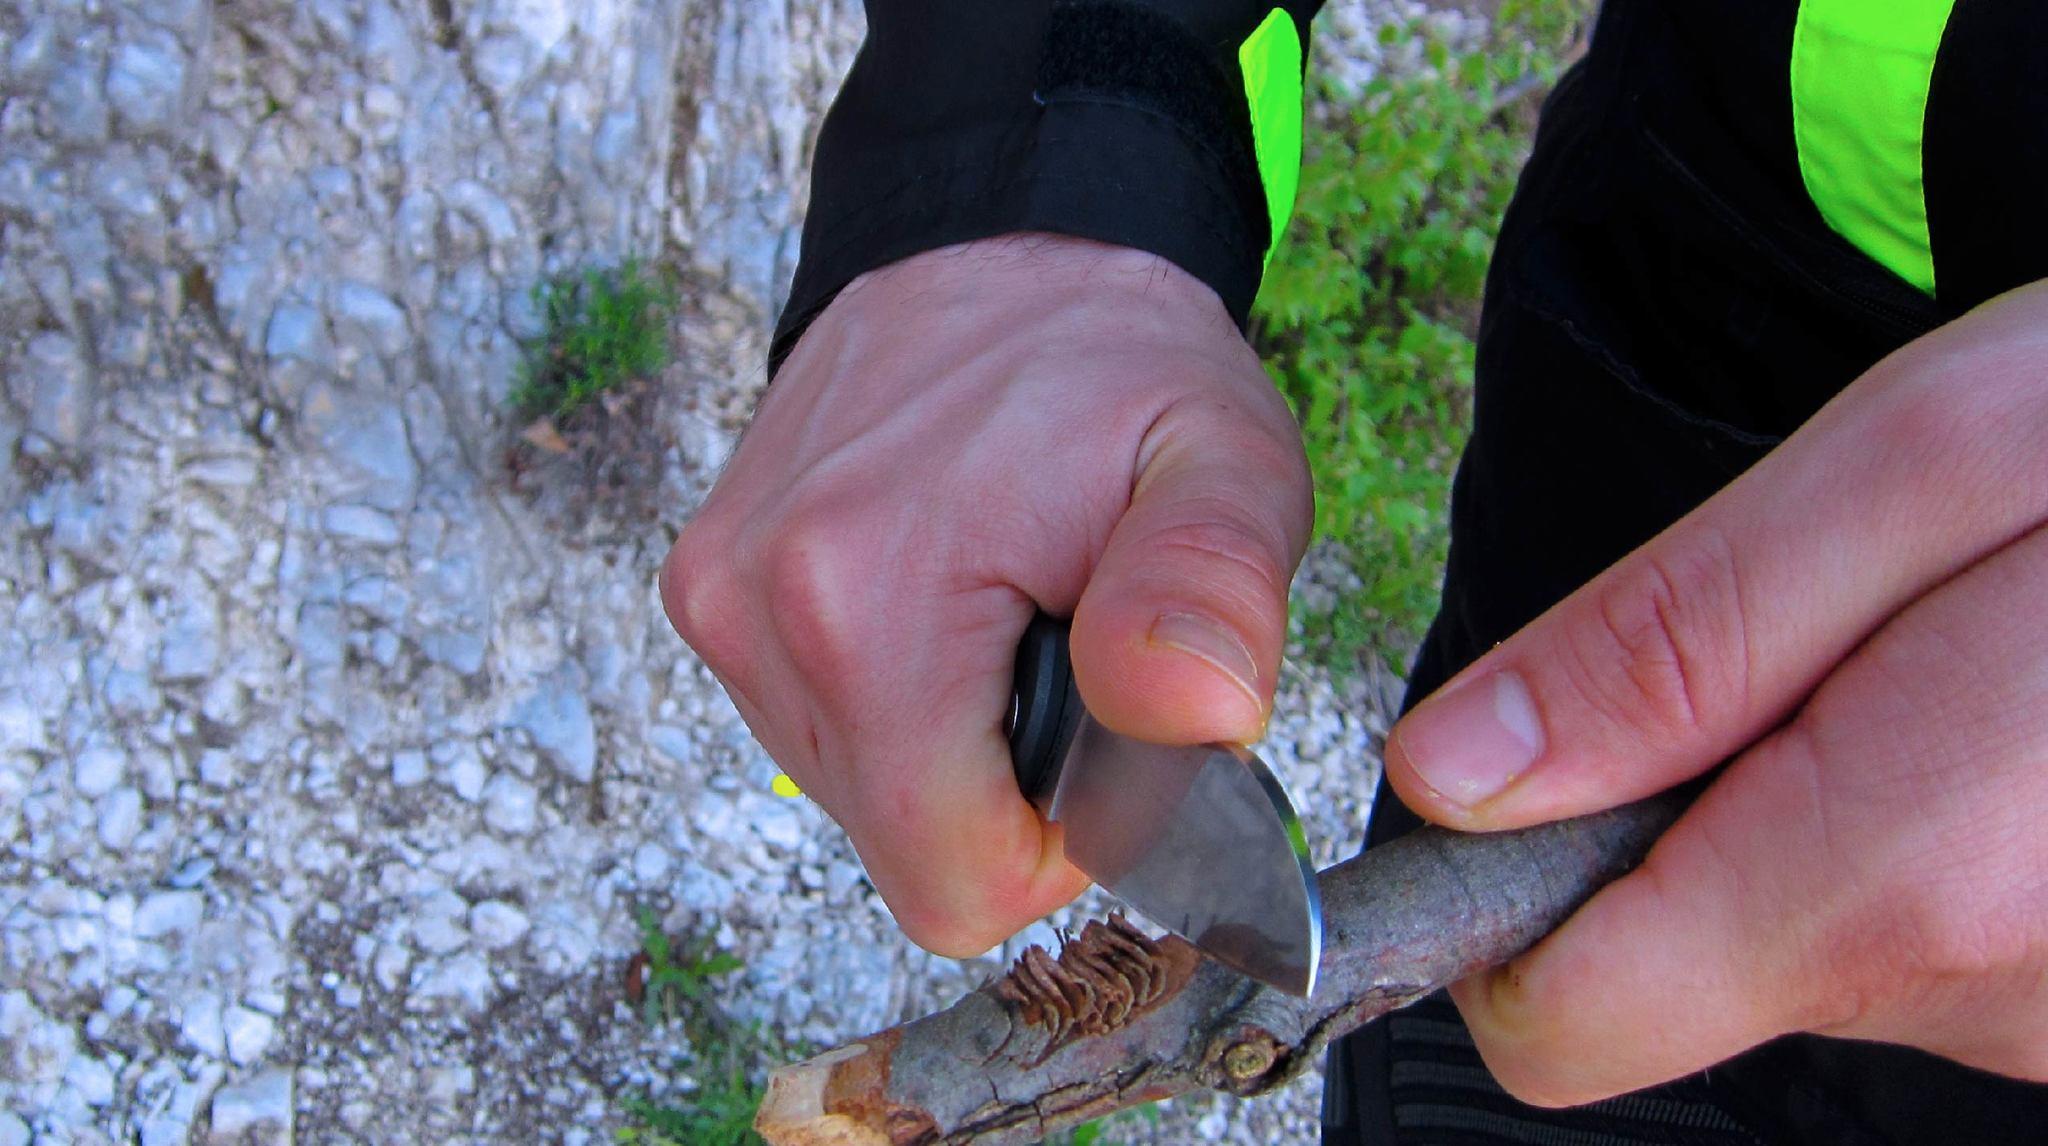 Фото 14 - Нож складной Fantoni, Raggio, FAN/NilteRAGGIO, сталь Sandvik 14C28N, рукоять Ixef, чёрный